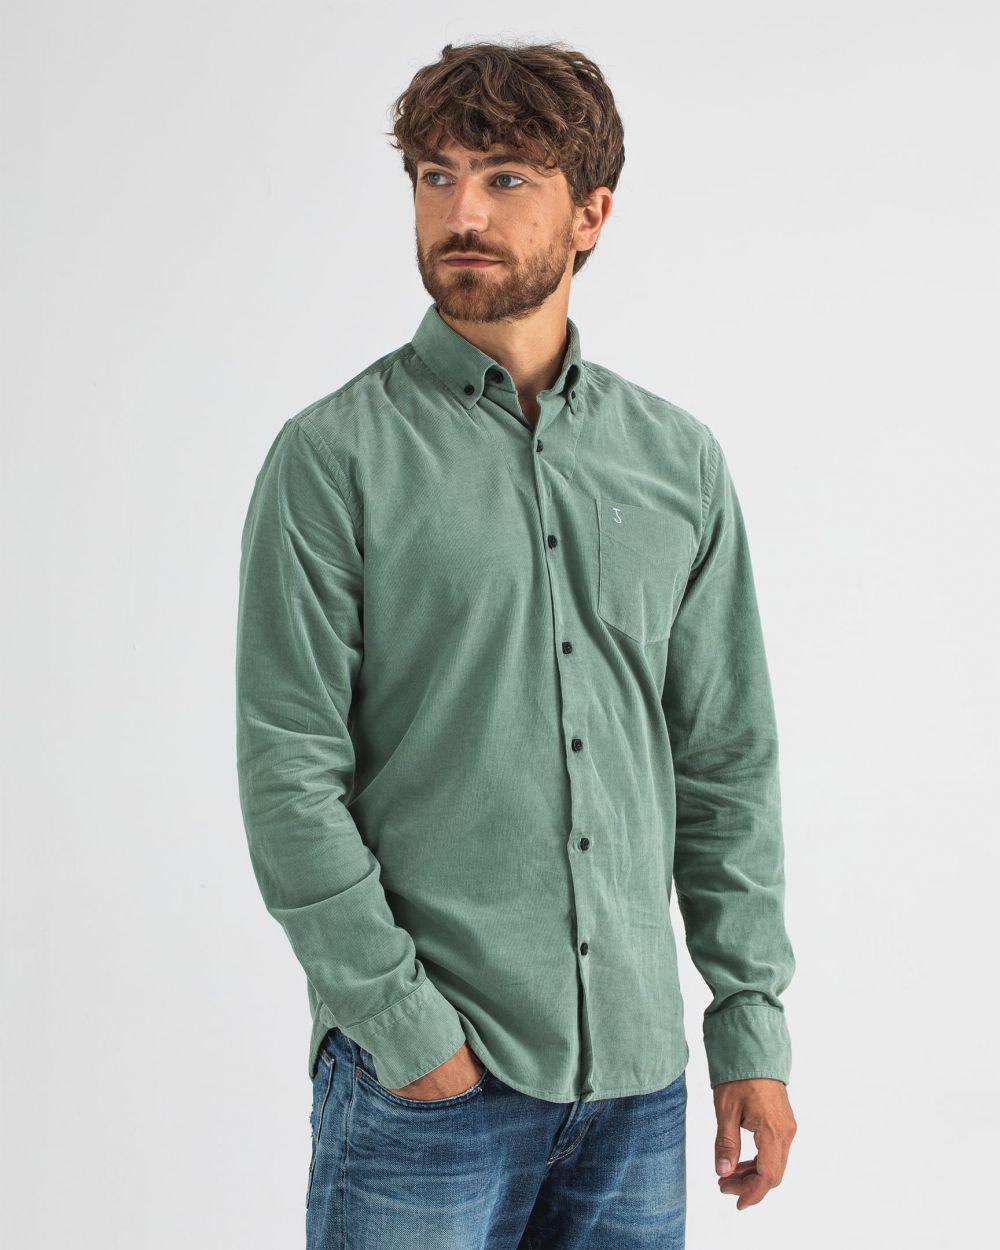 Robbins babycord shirt deplhi green-2